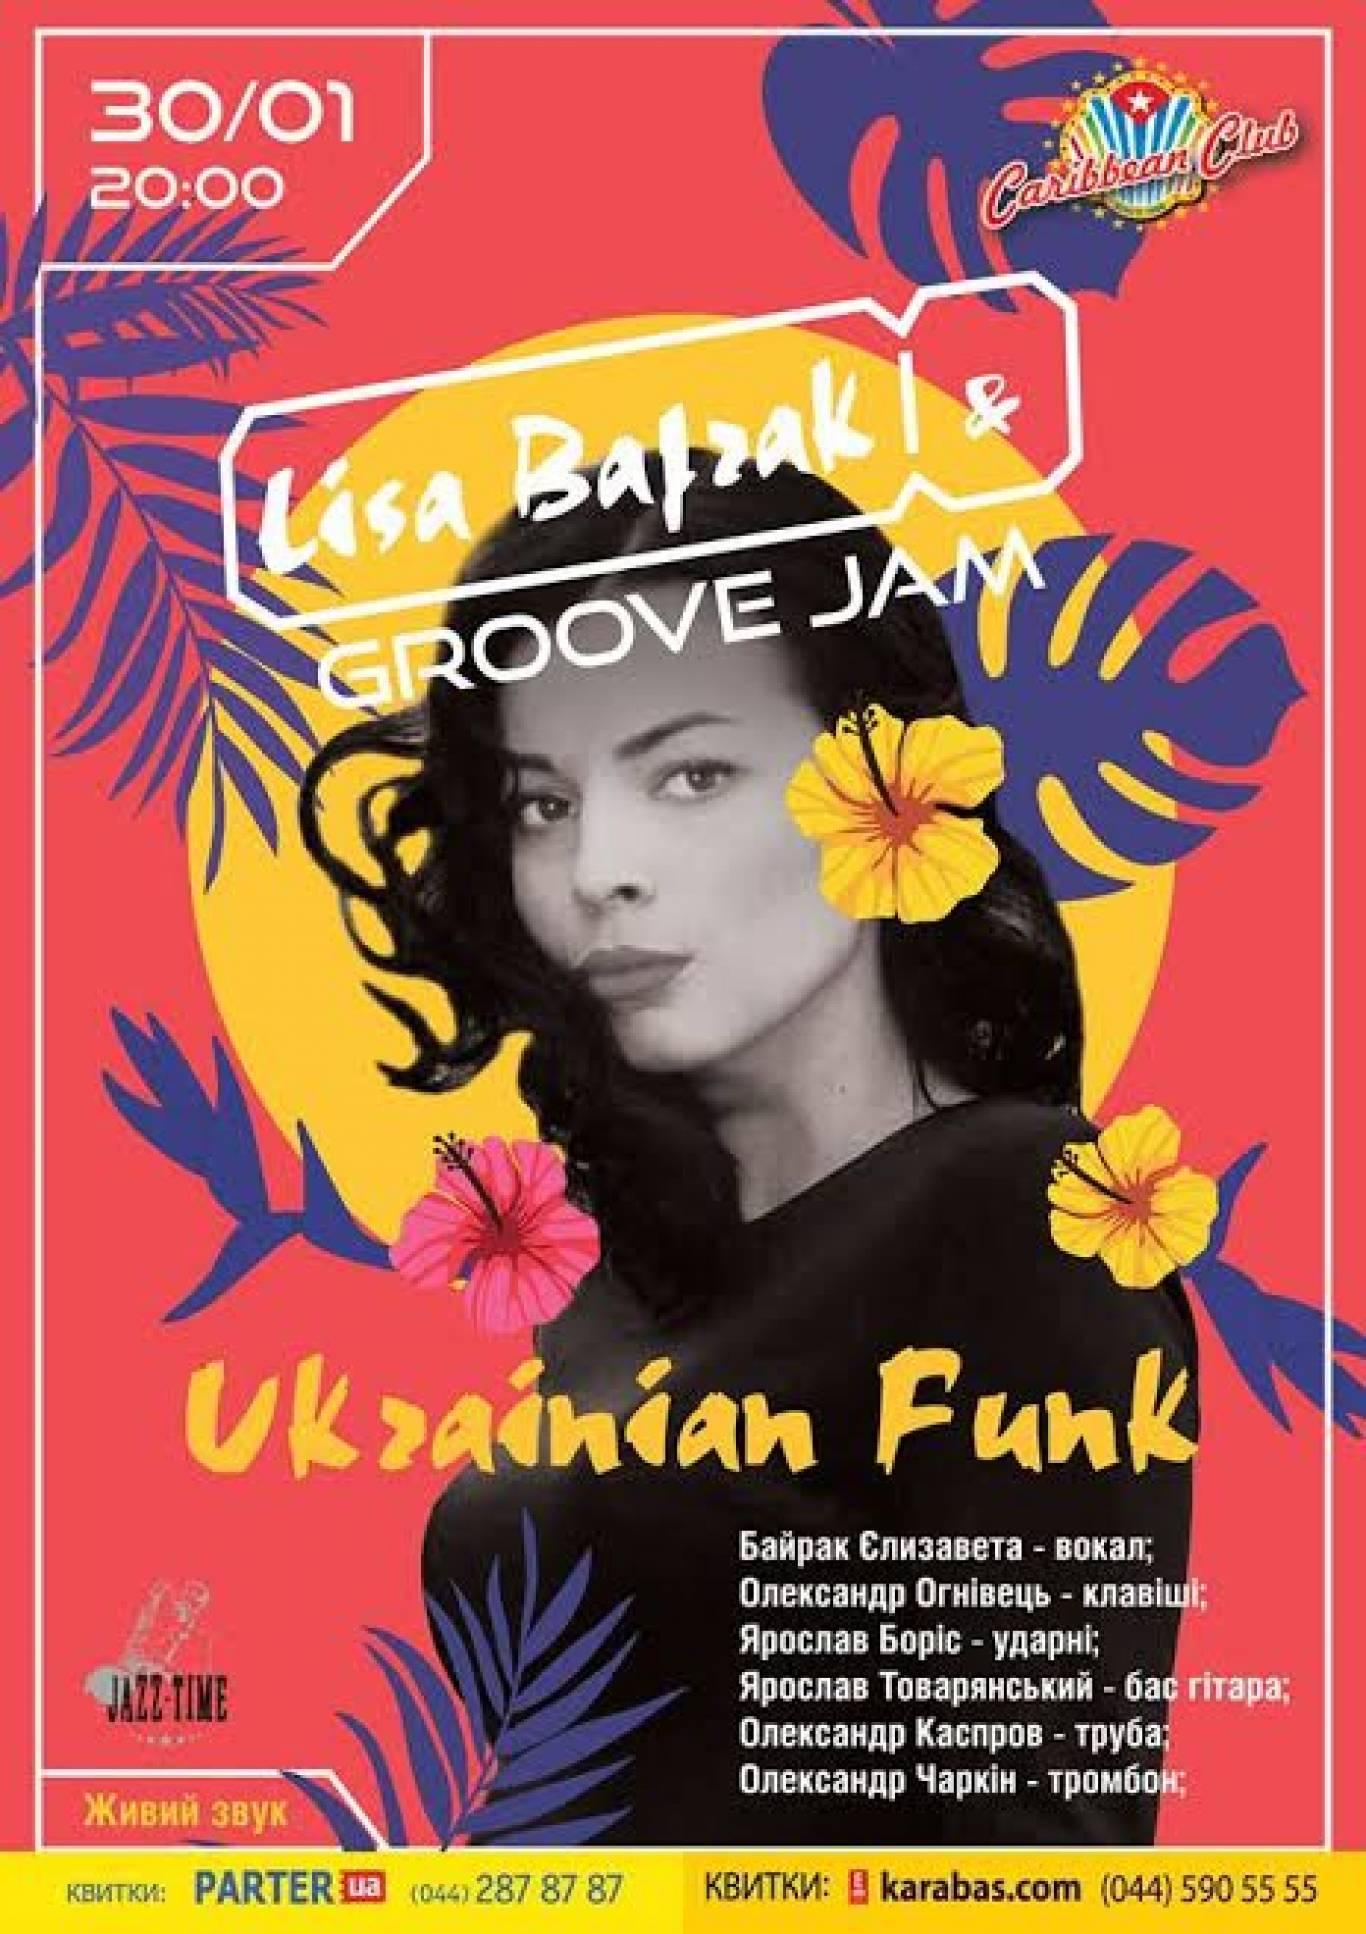 Фанк по-украински | Lisa Bajrak & Groove Jam